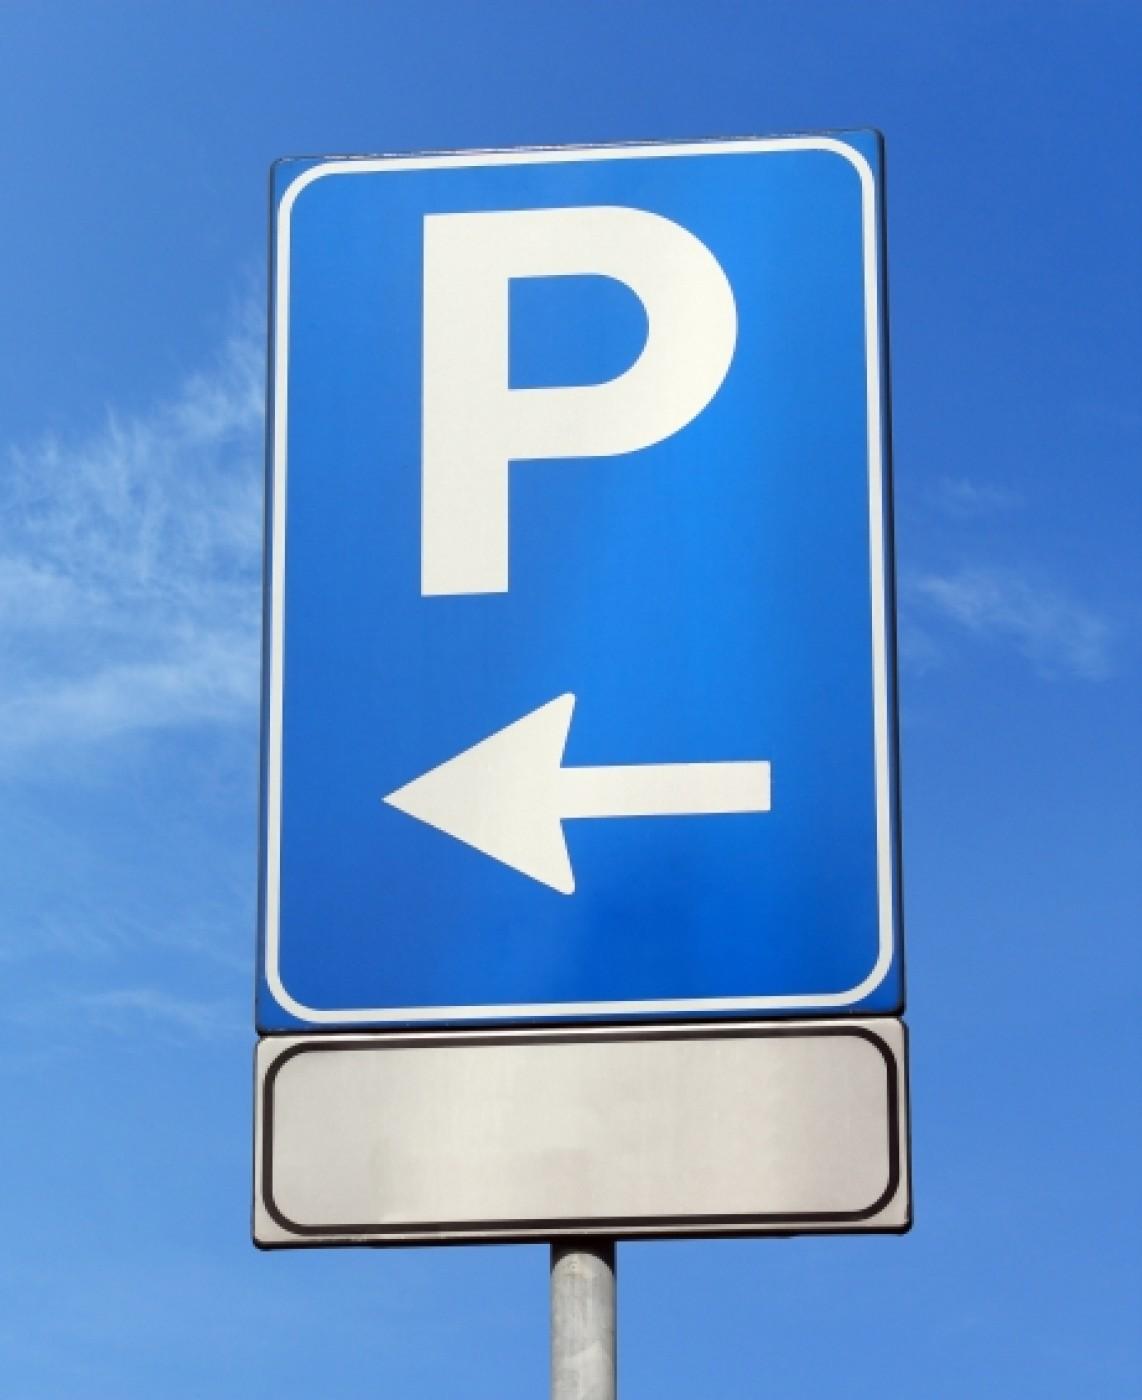 Alicante-Elche airport parking with We Park ALC